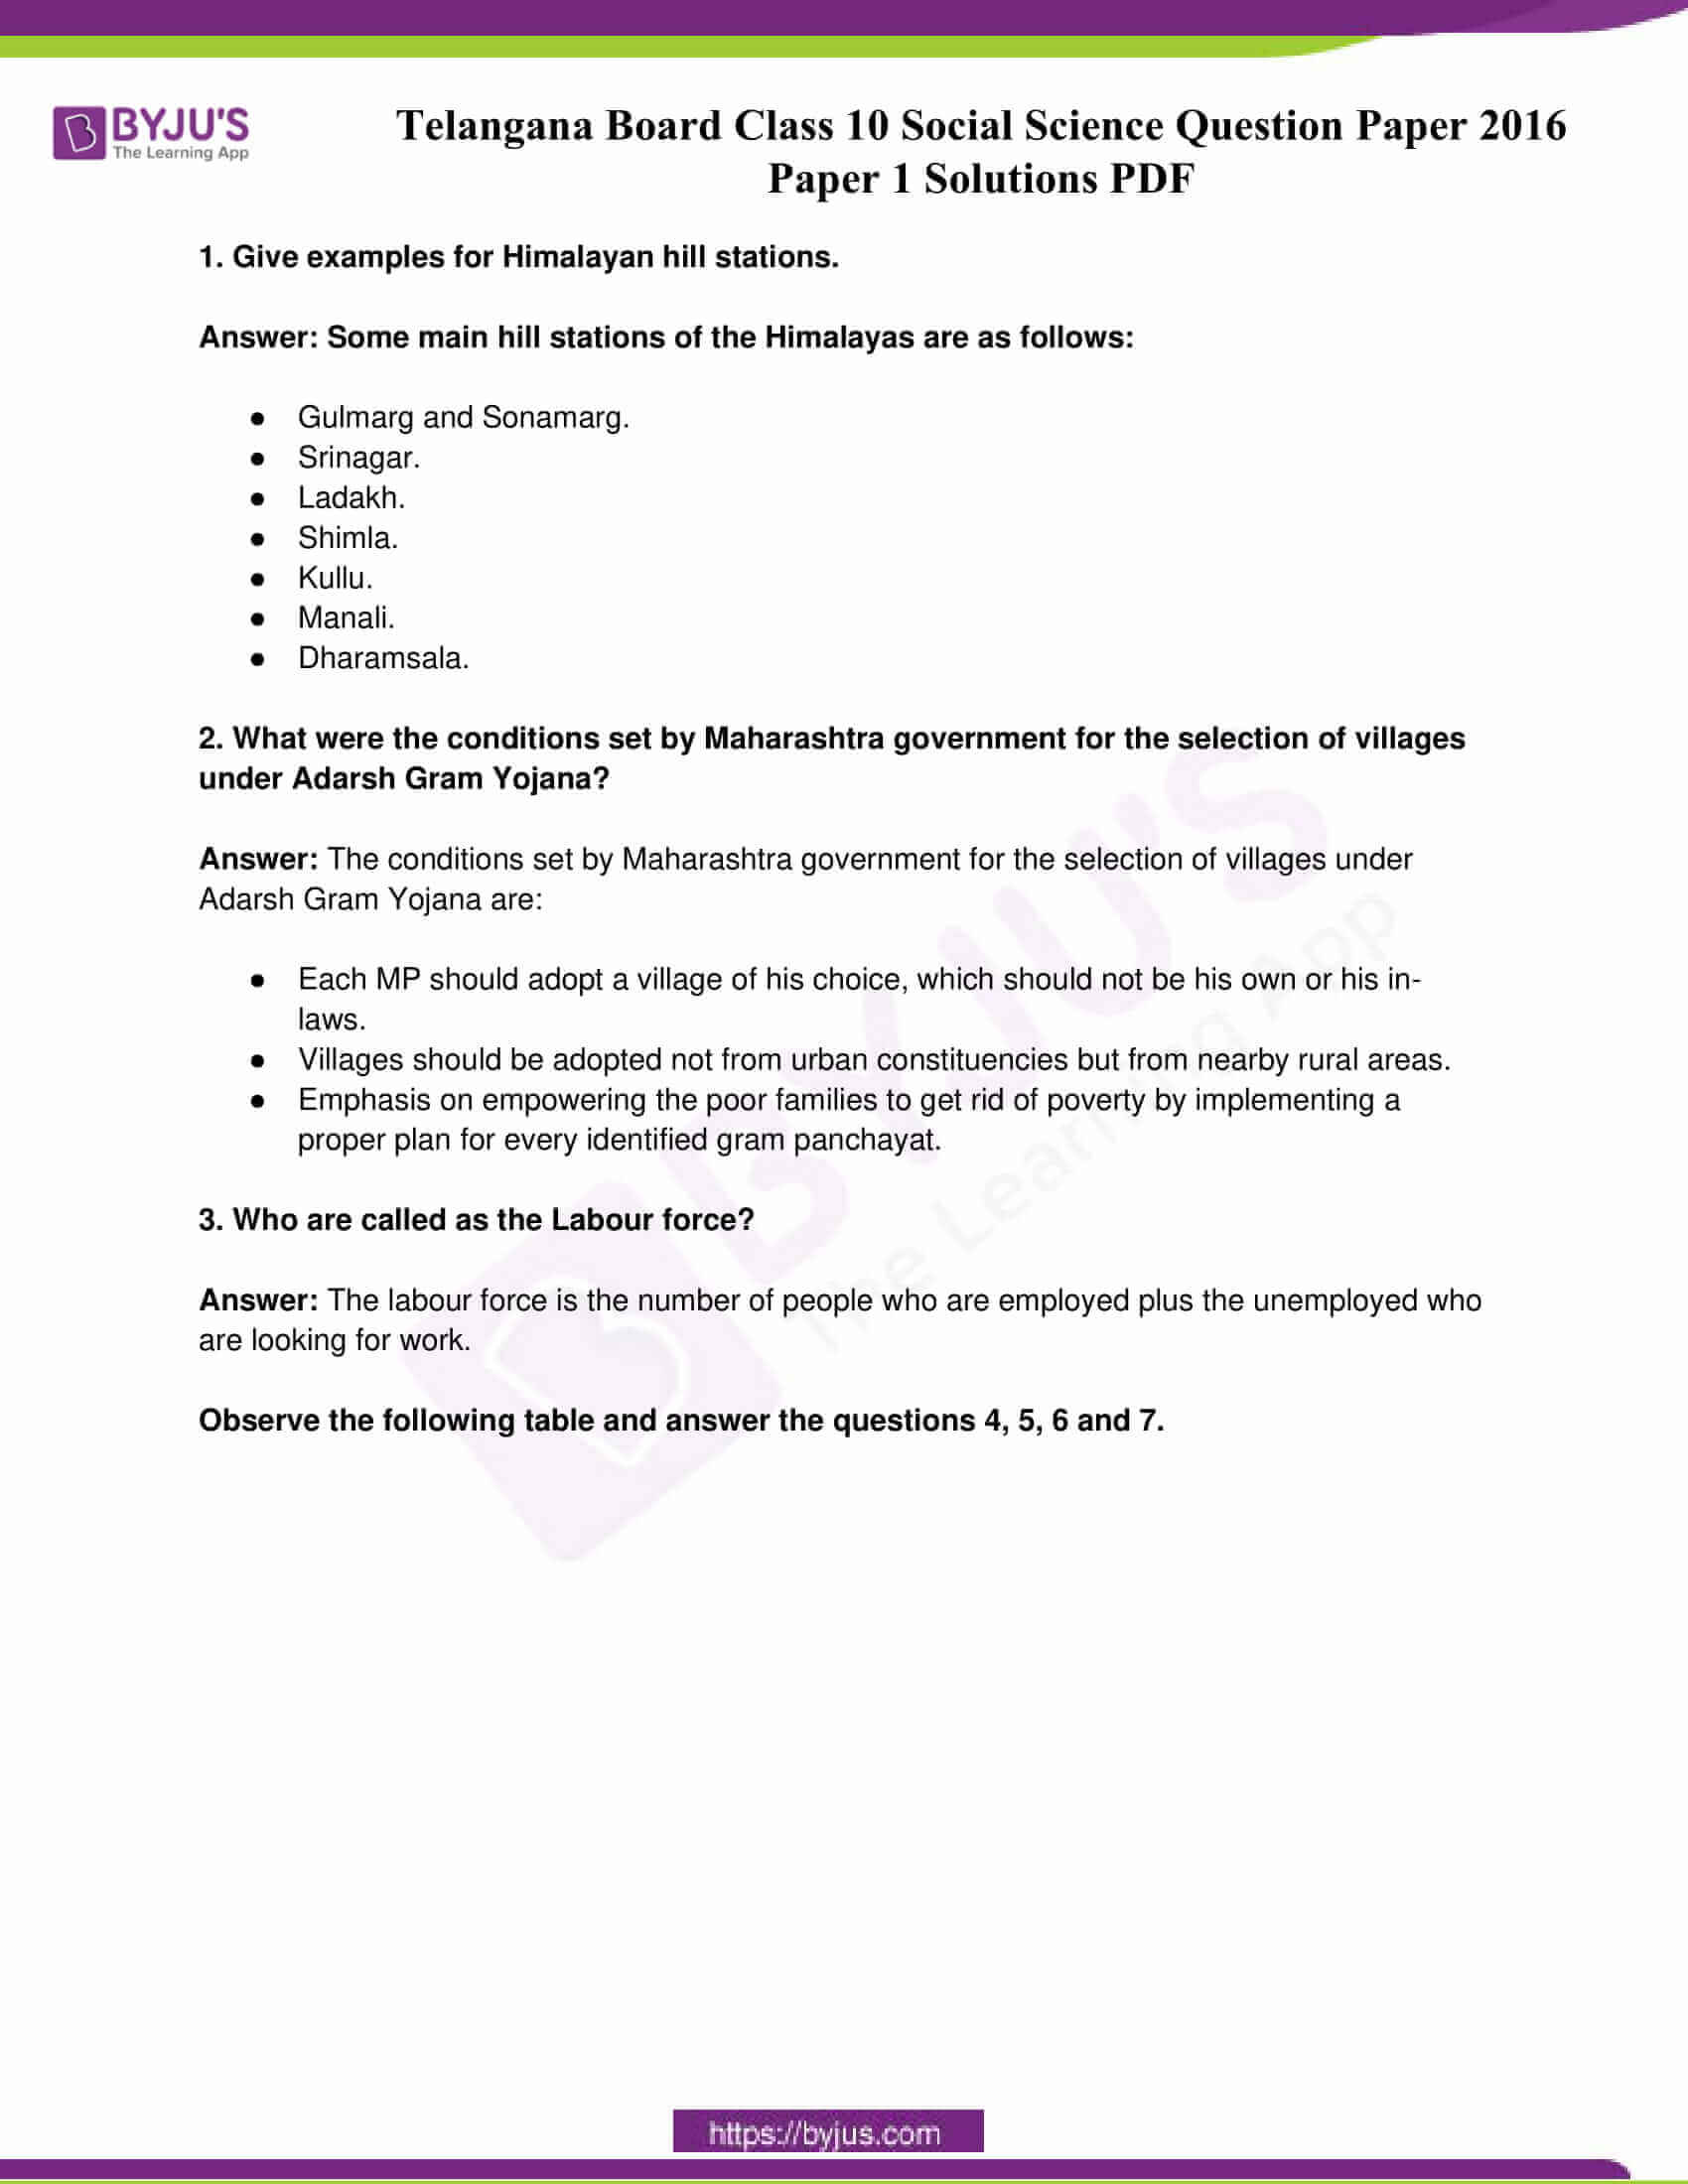 telangana board class 10 social science 2016 paper 1 solutions 1